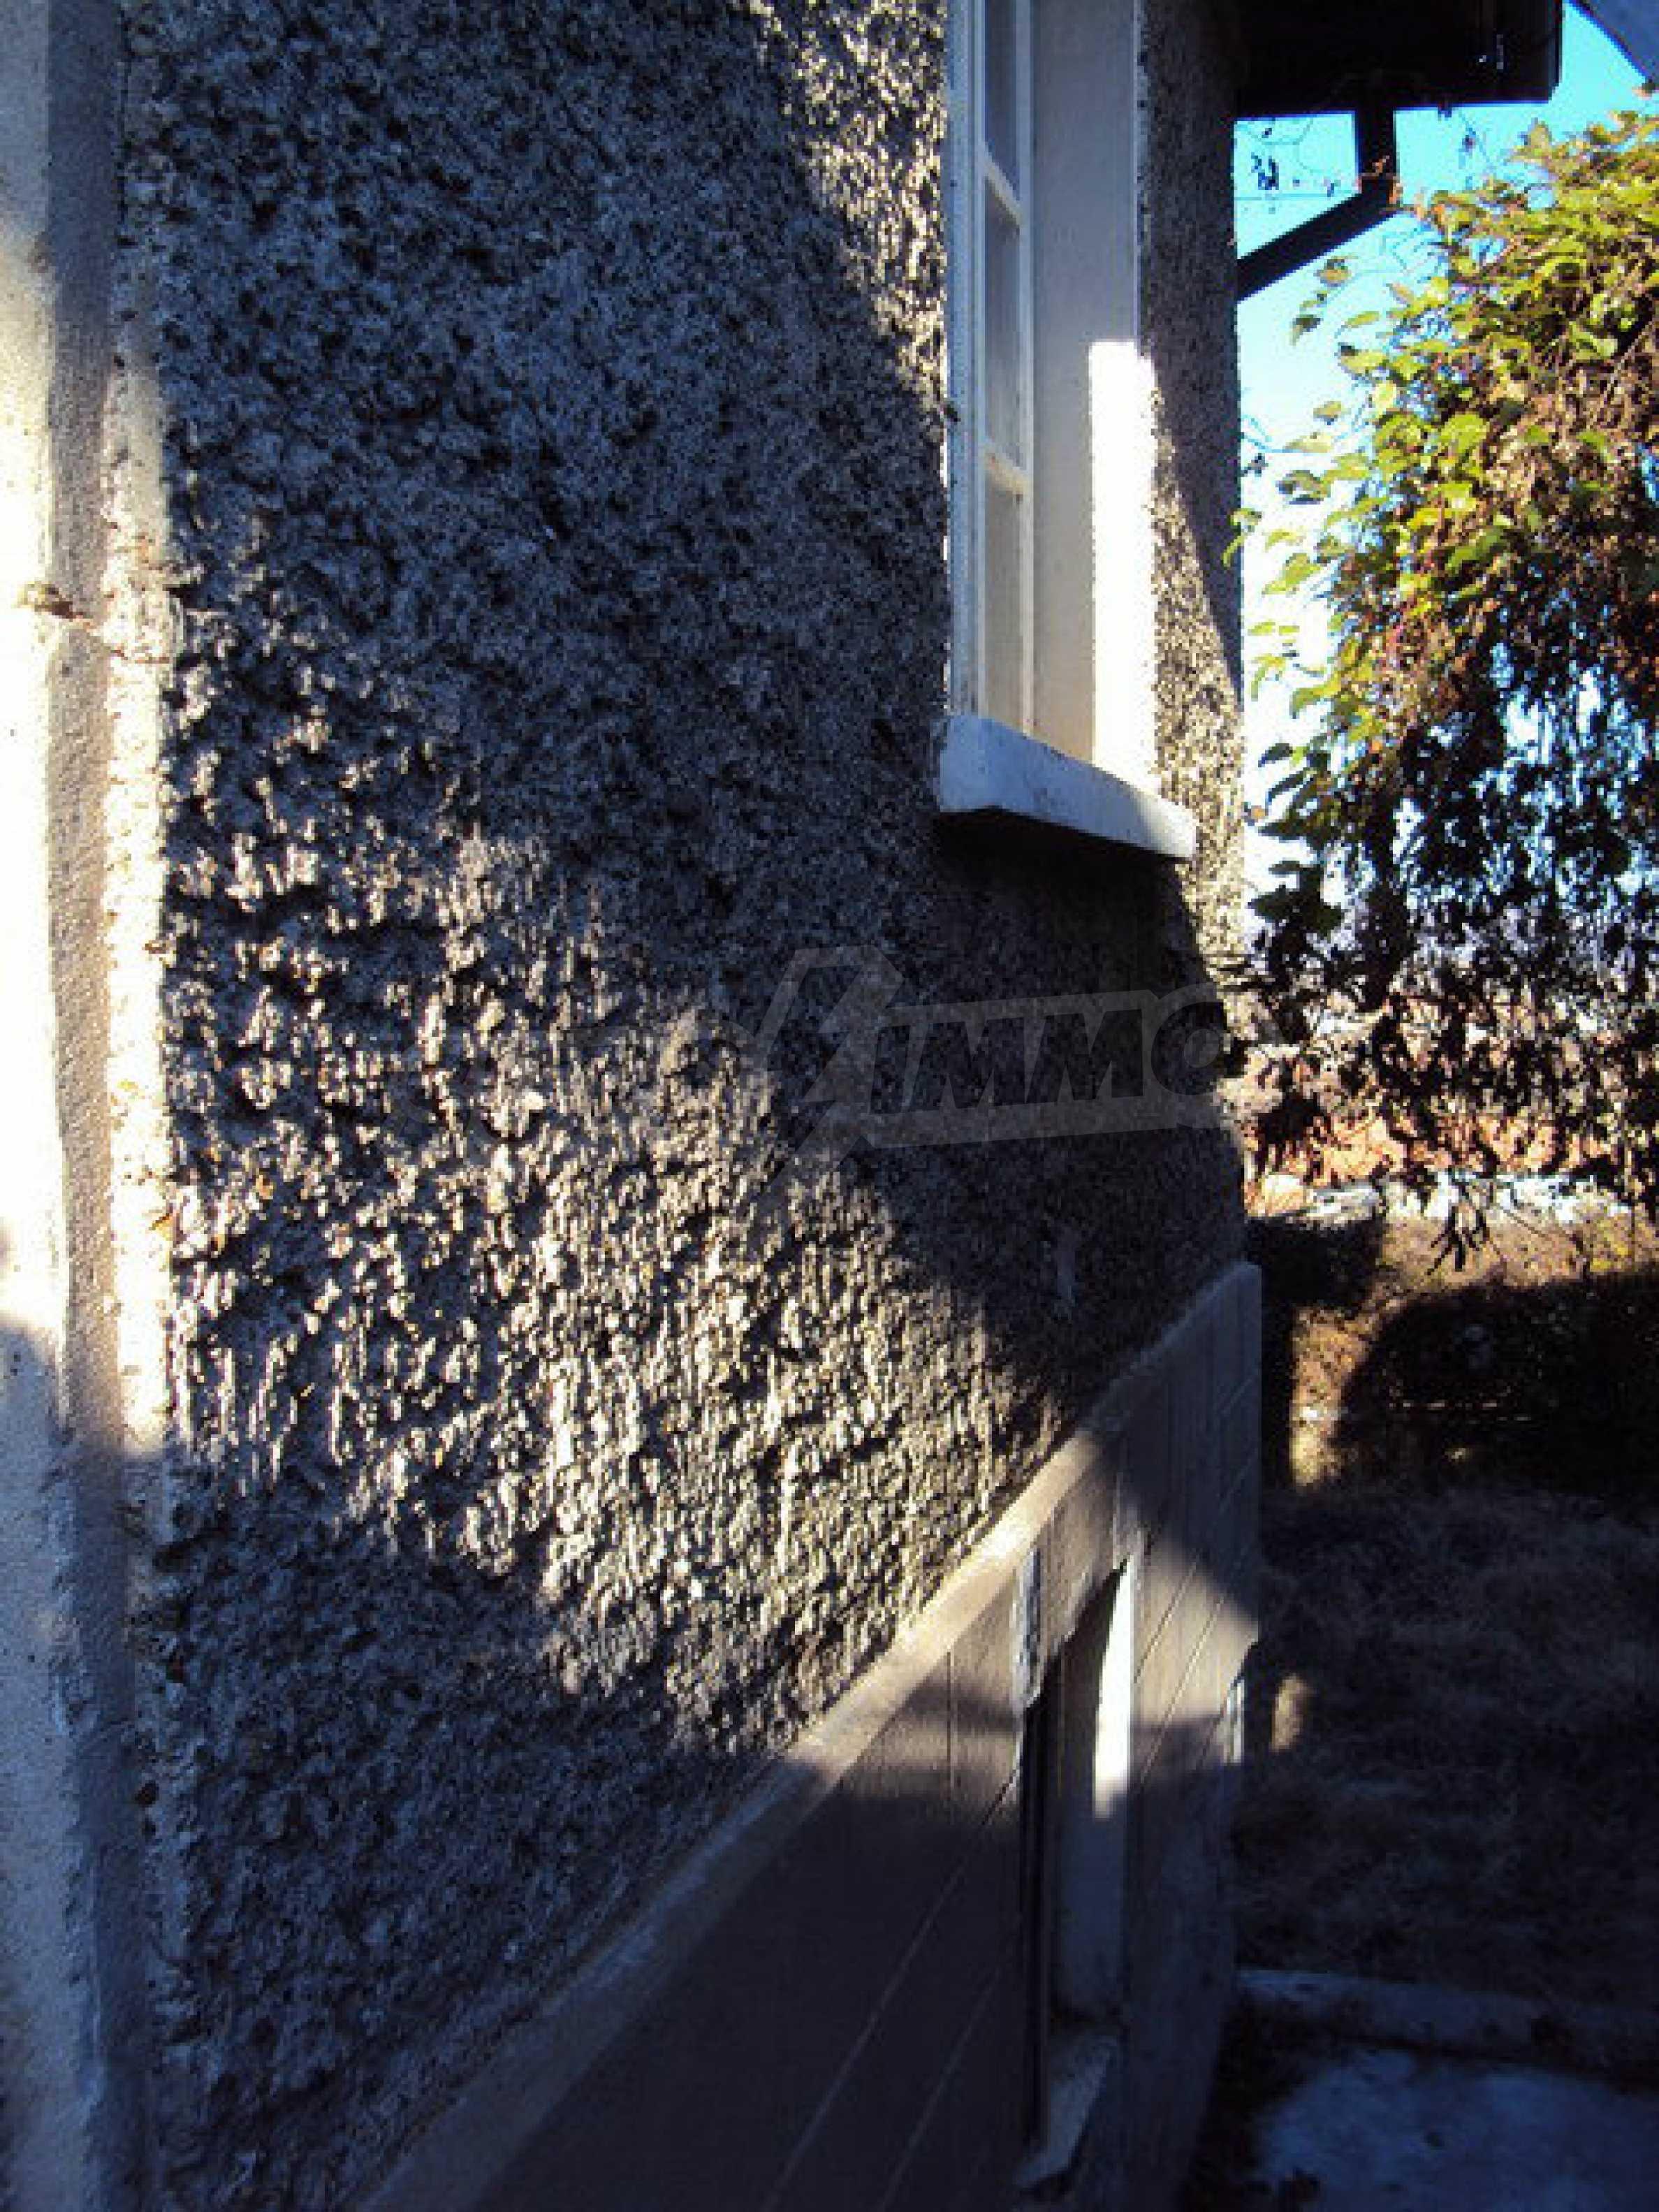 House with garden 25 km away from Veliko Tarnovo 2